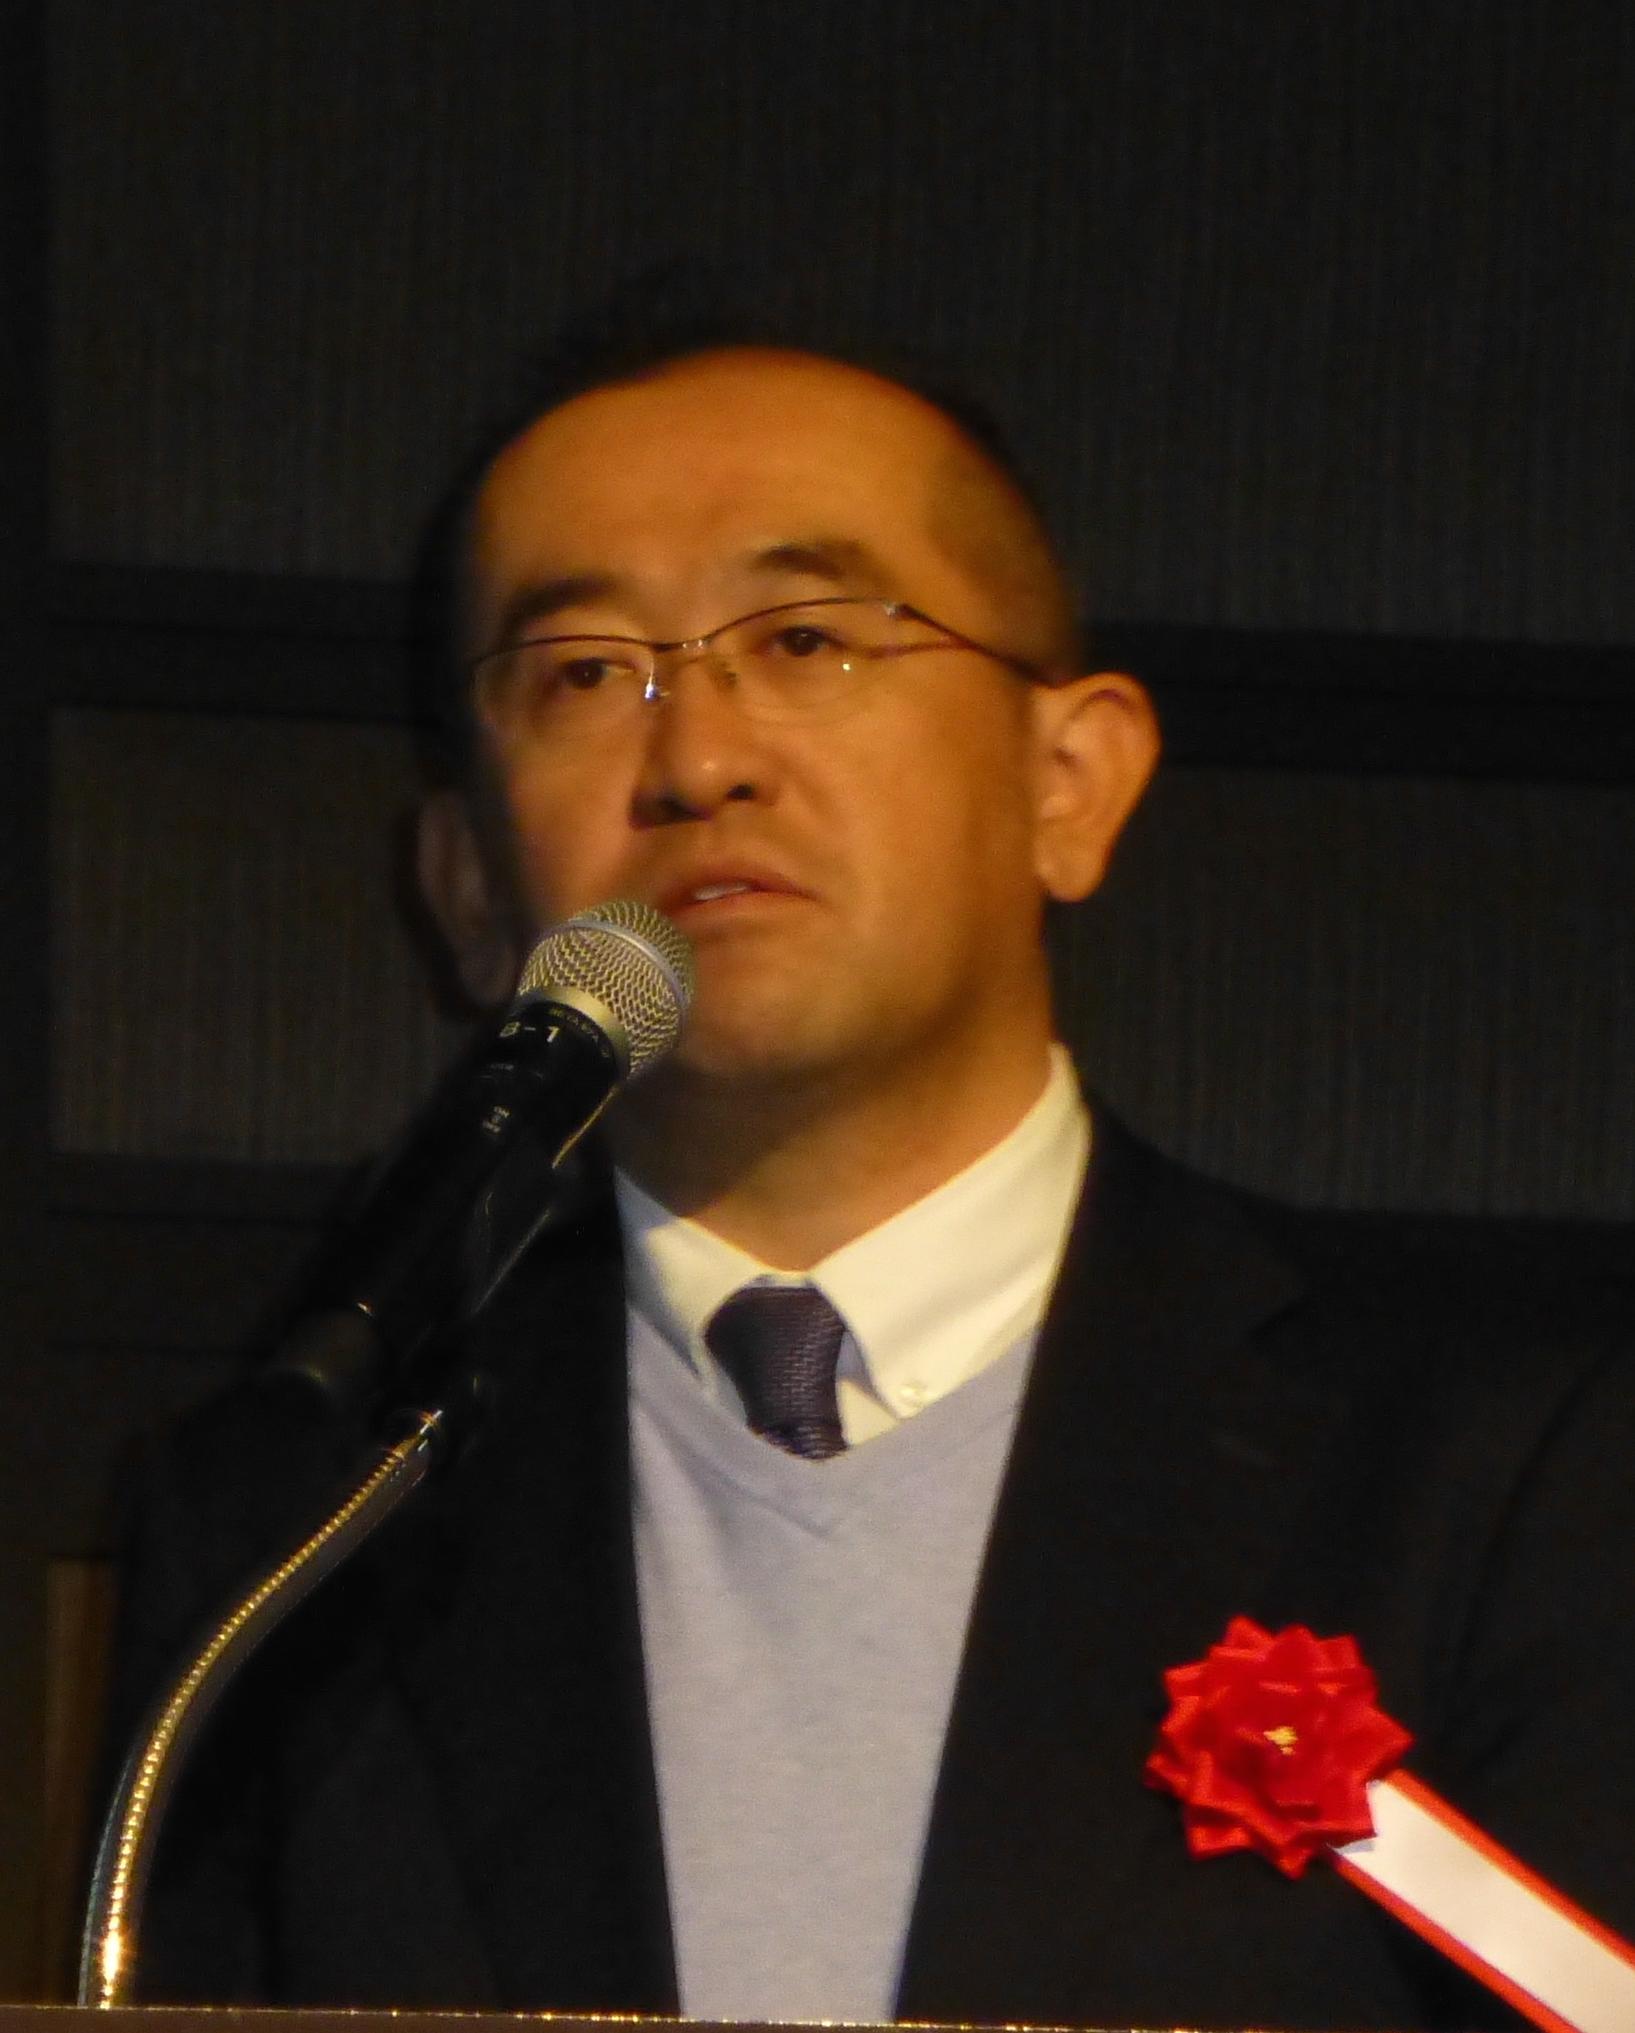 NTTドコモ・プロダクト部プロダクトイノベーション担当部長の森山光一氏